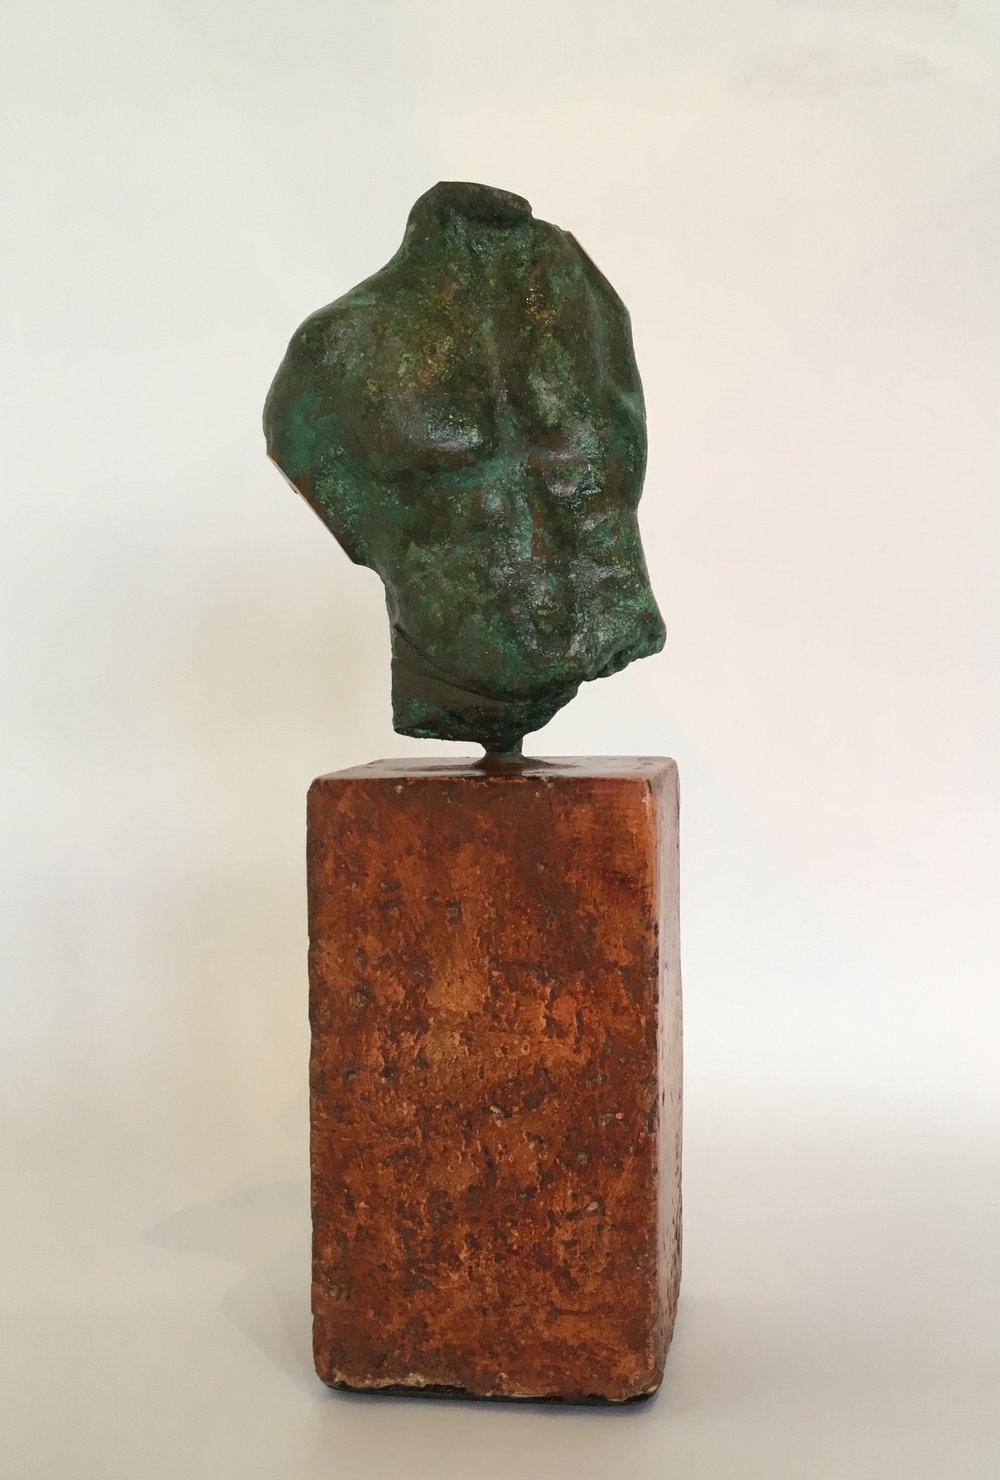 Title: Torso II  Size: H 25 cm  Medium: Bronze Edition 1/1  Price: £1500